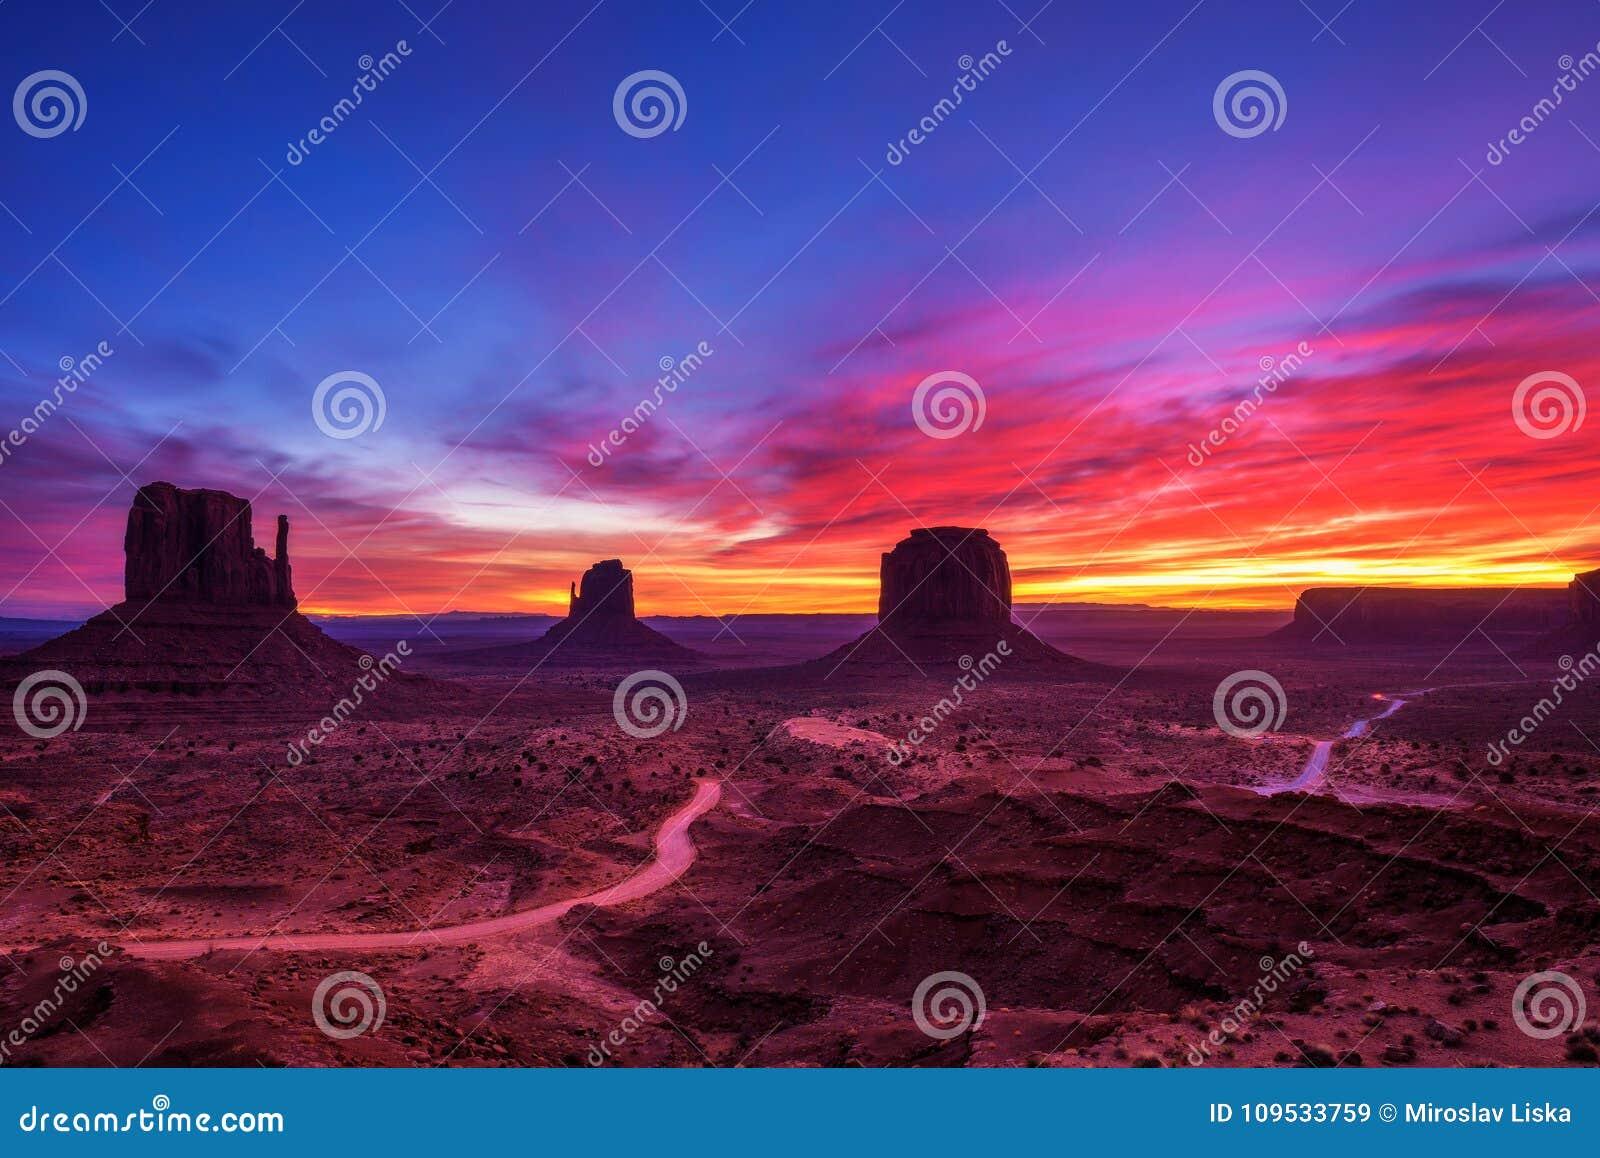 Sonnenaufgang über Monument-Tal, Arizona, USA